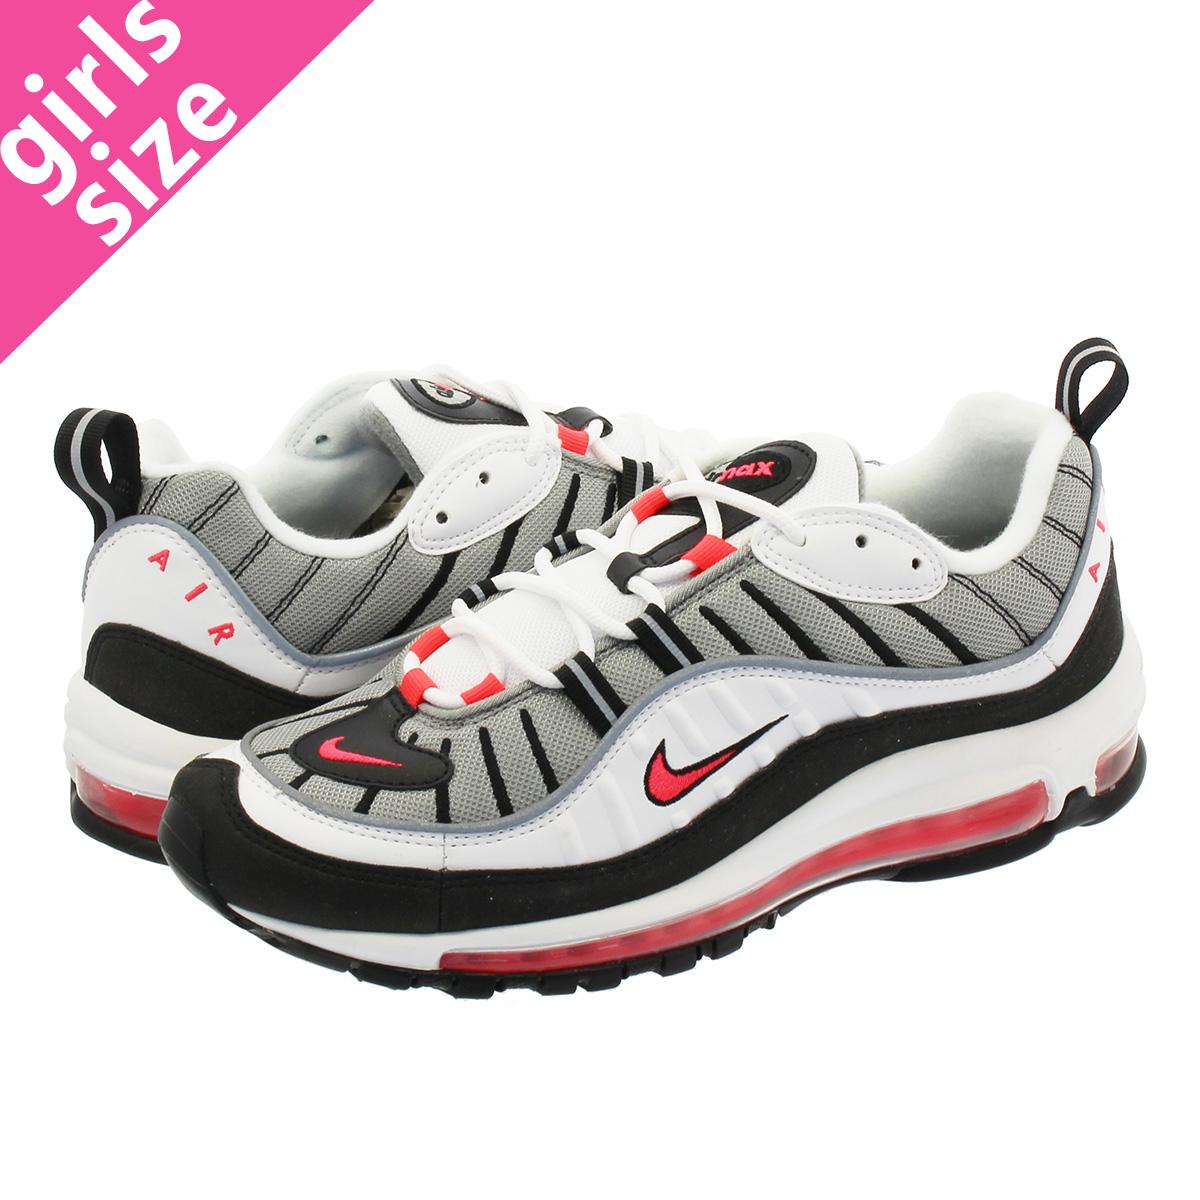 low priced 7fcb1 c2d36 NIKE WMNS AIR MAX 98 Nike women Air Max 98 WHITE/SOLAR RED/DUST/REFLECT  SILVER ah6799-104